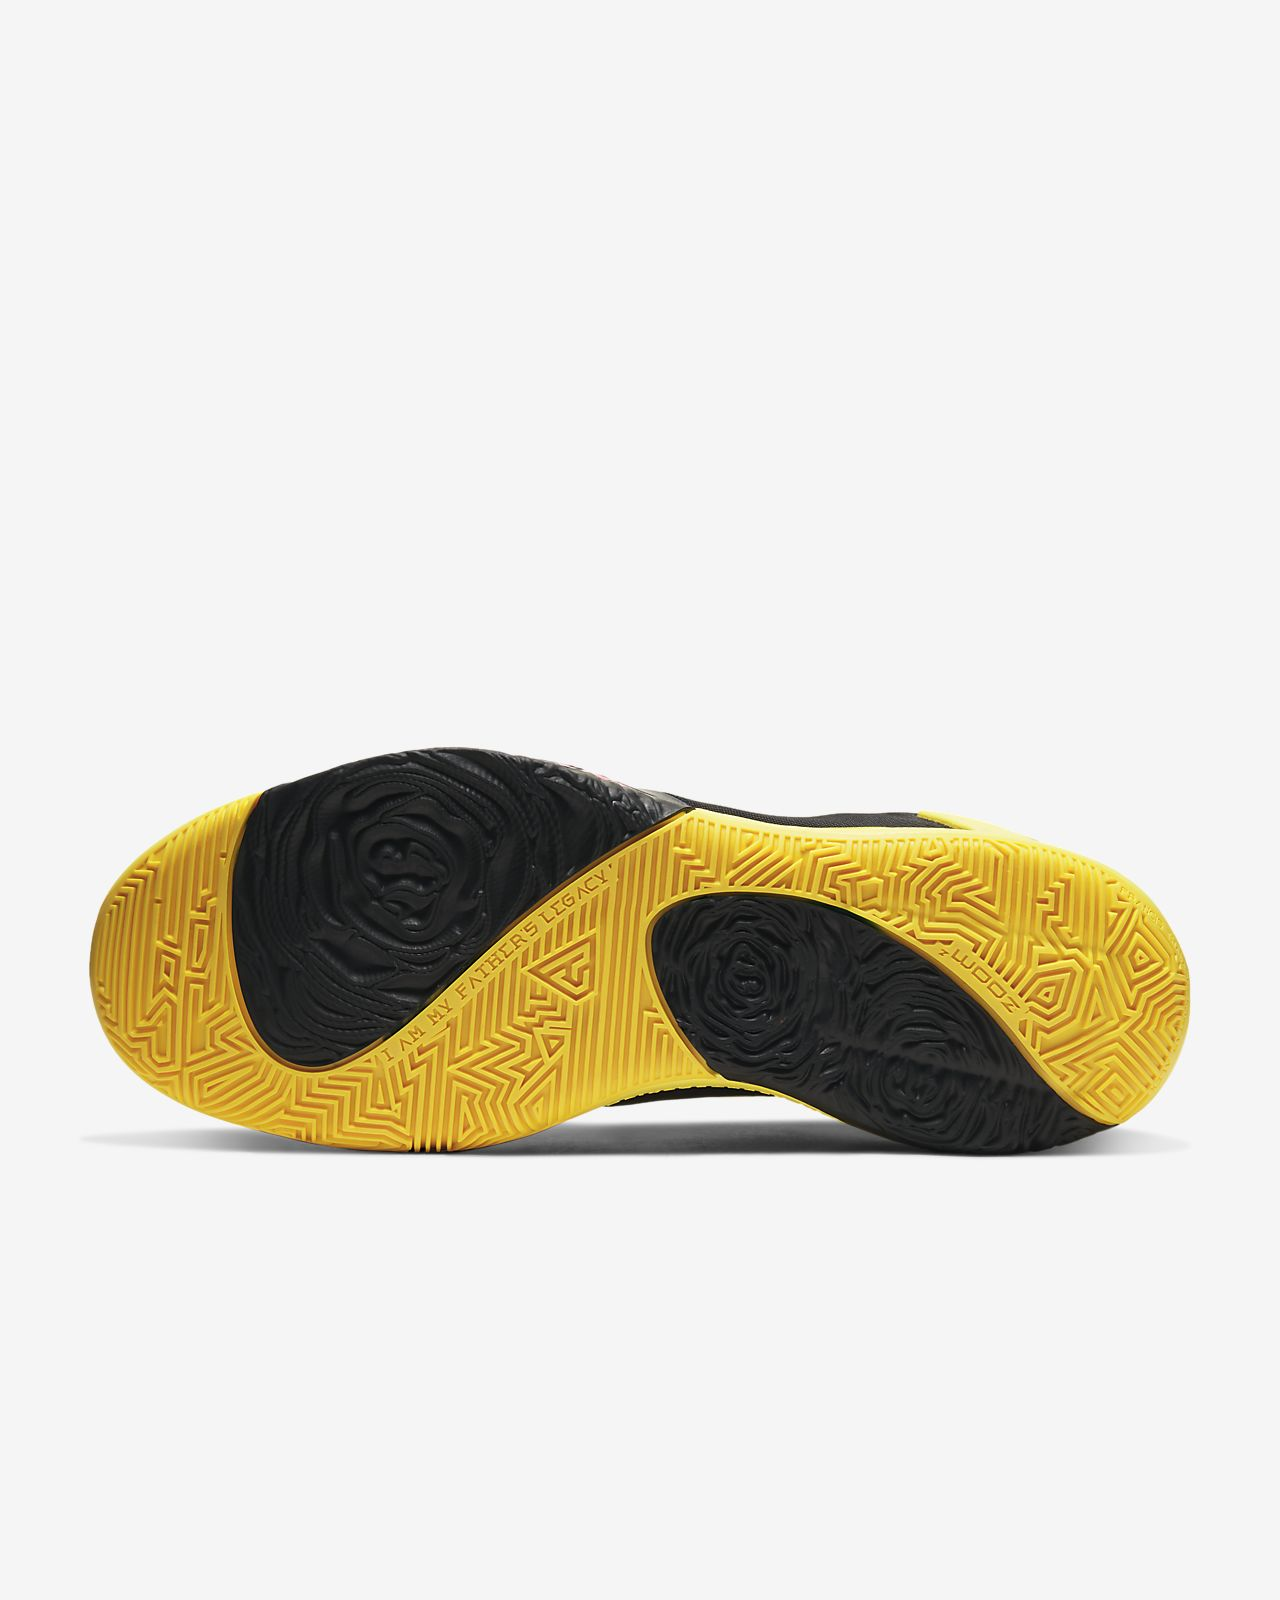 Last Minute Frauen Männer Nike Schuhe Welcome Back The